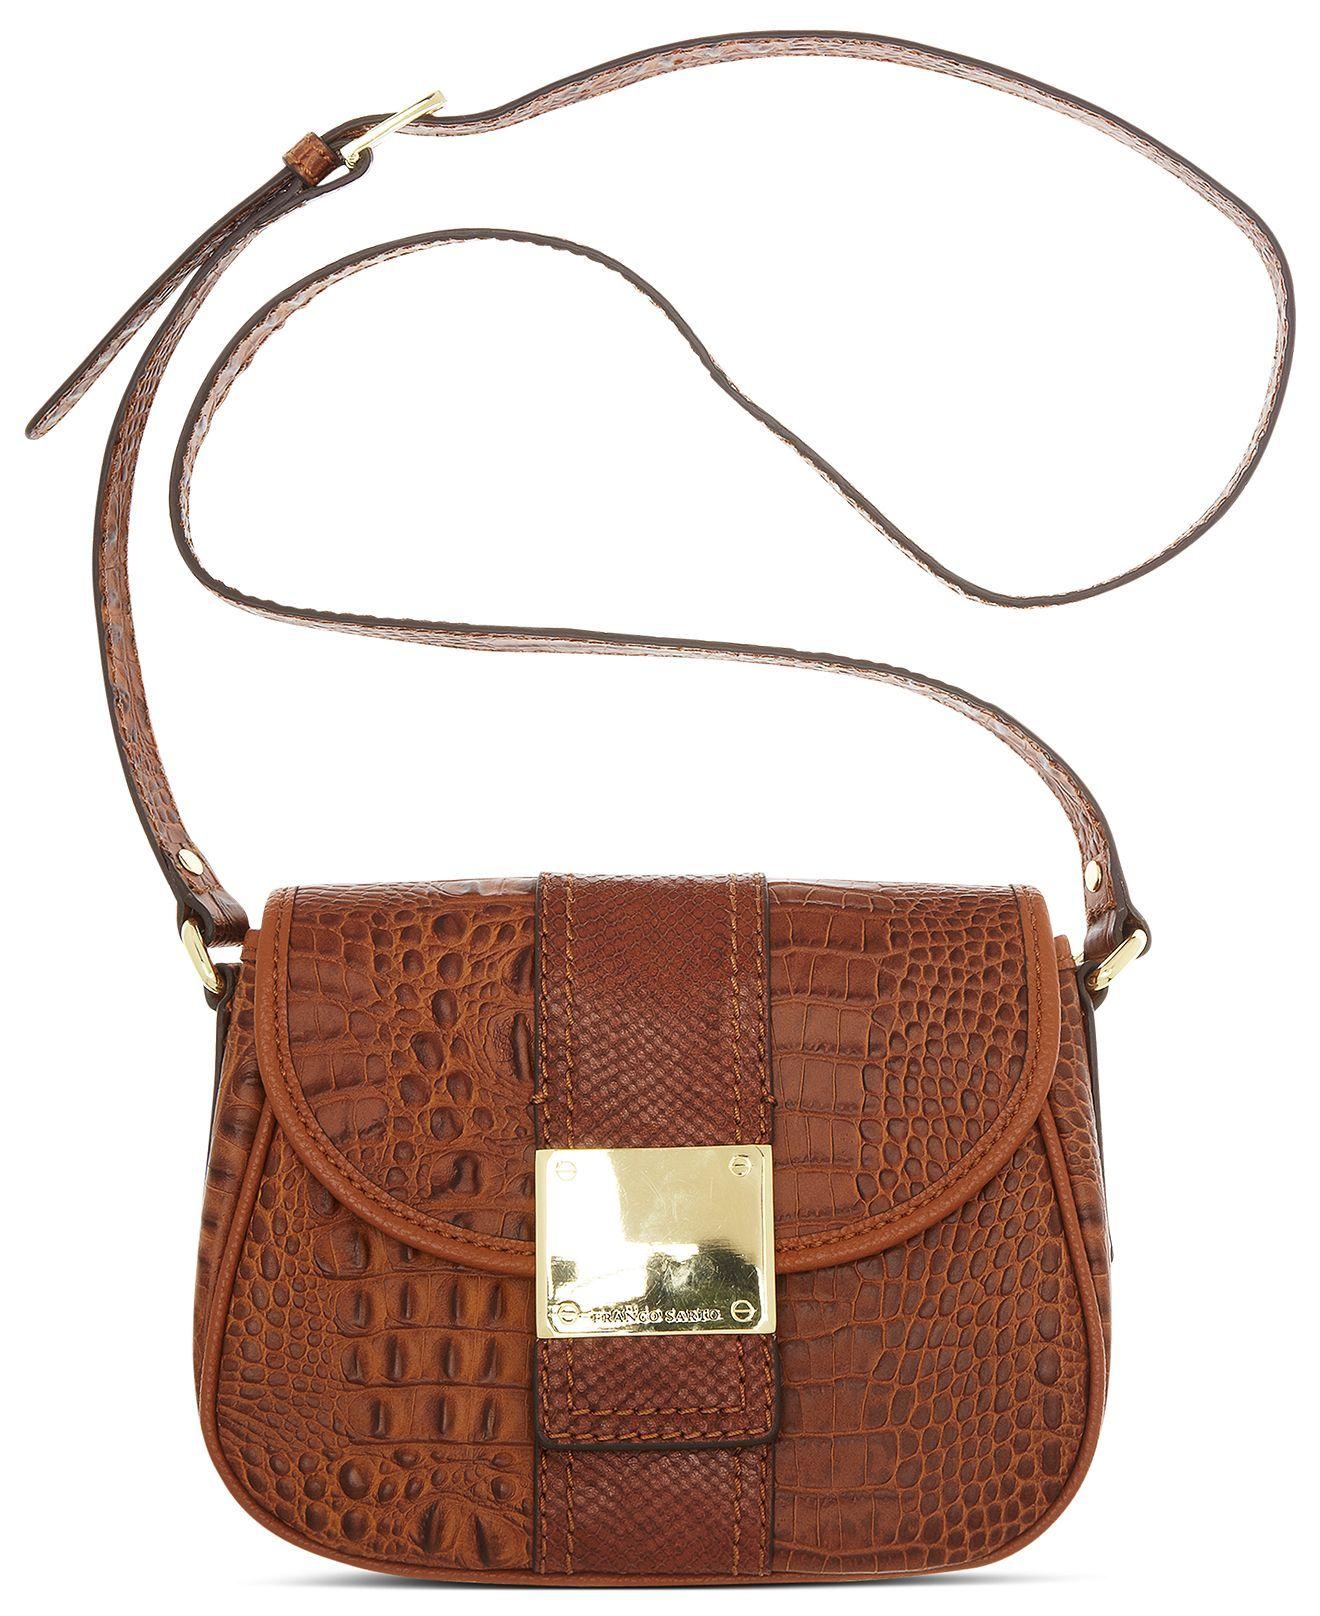 Franco Sarto Handbag Croc Leather Kidman Crossbody